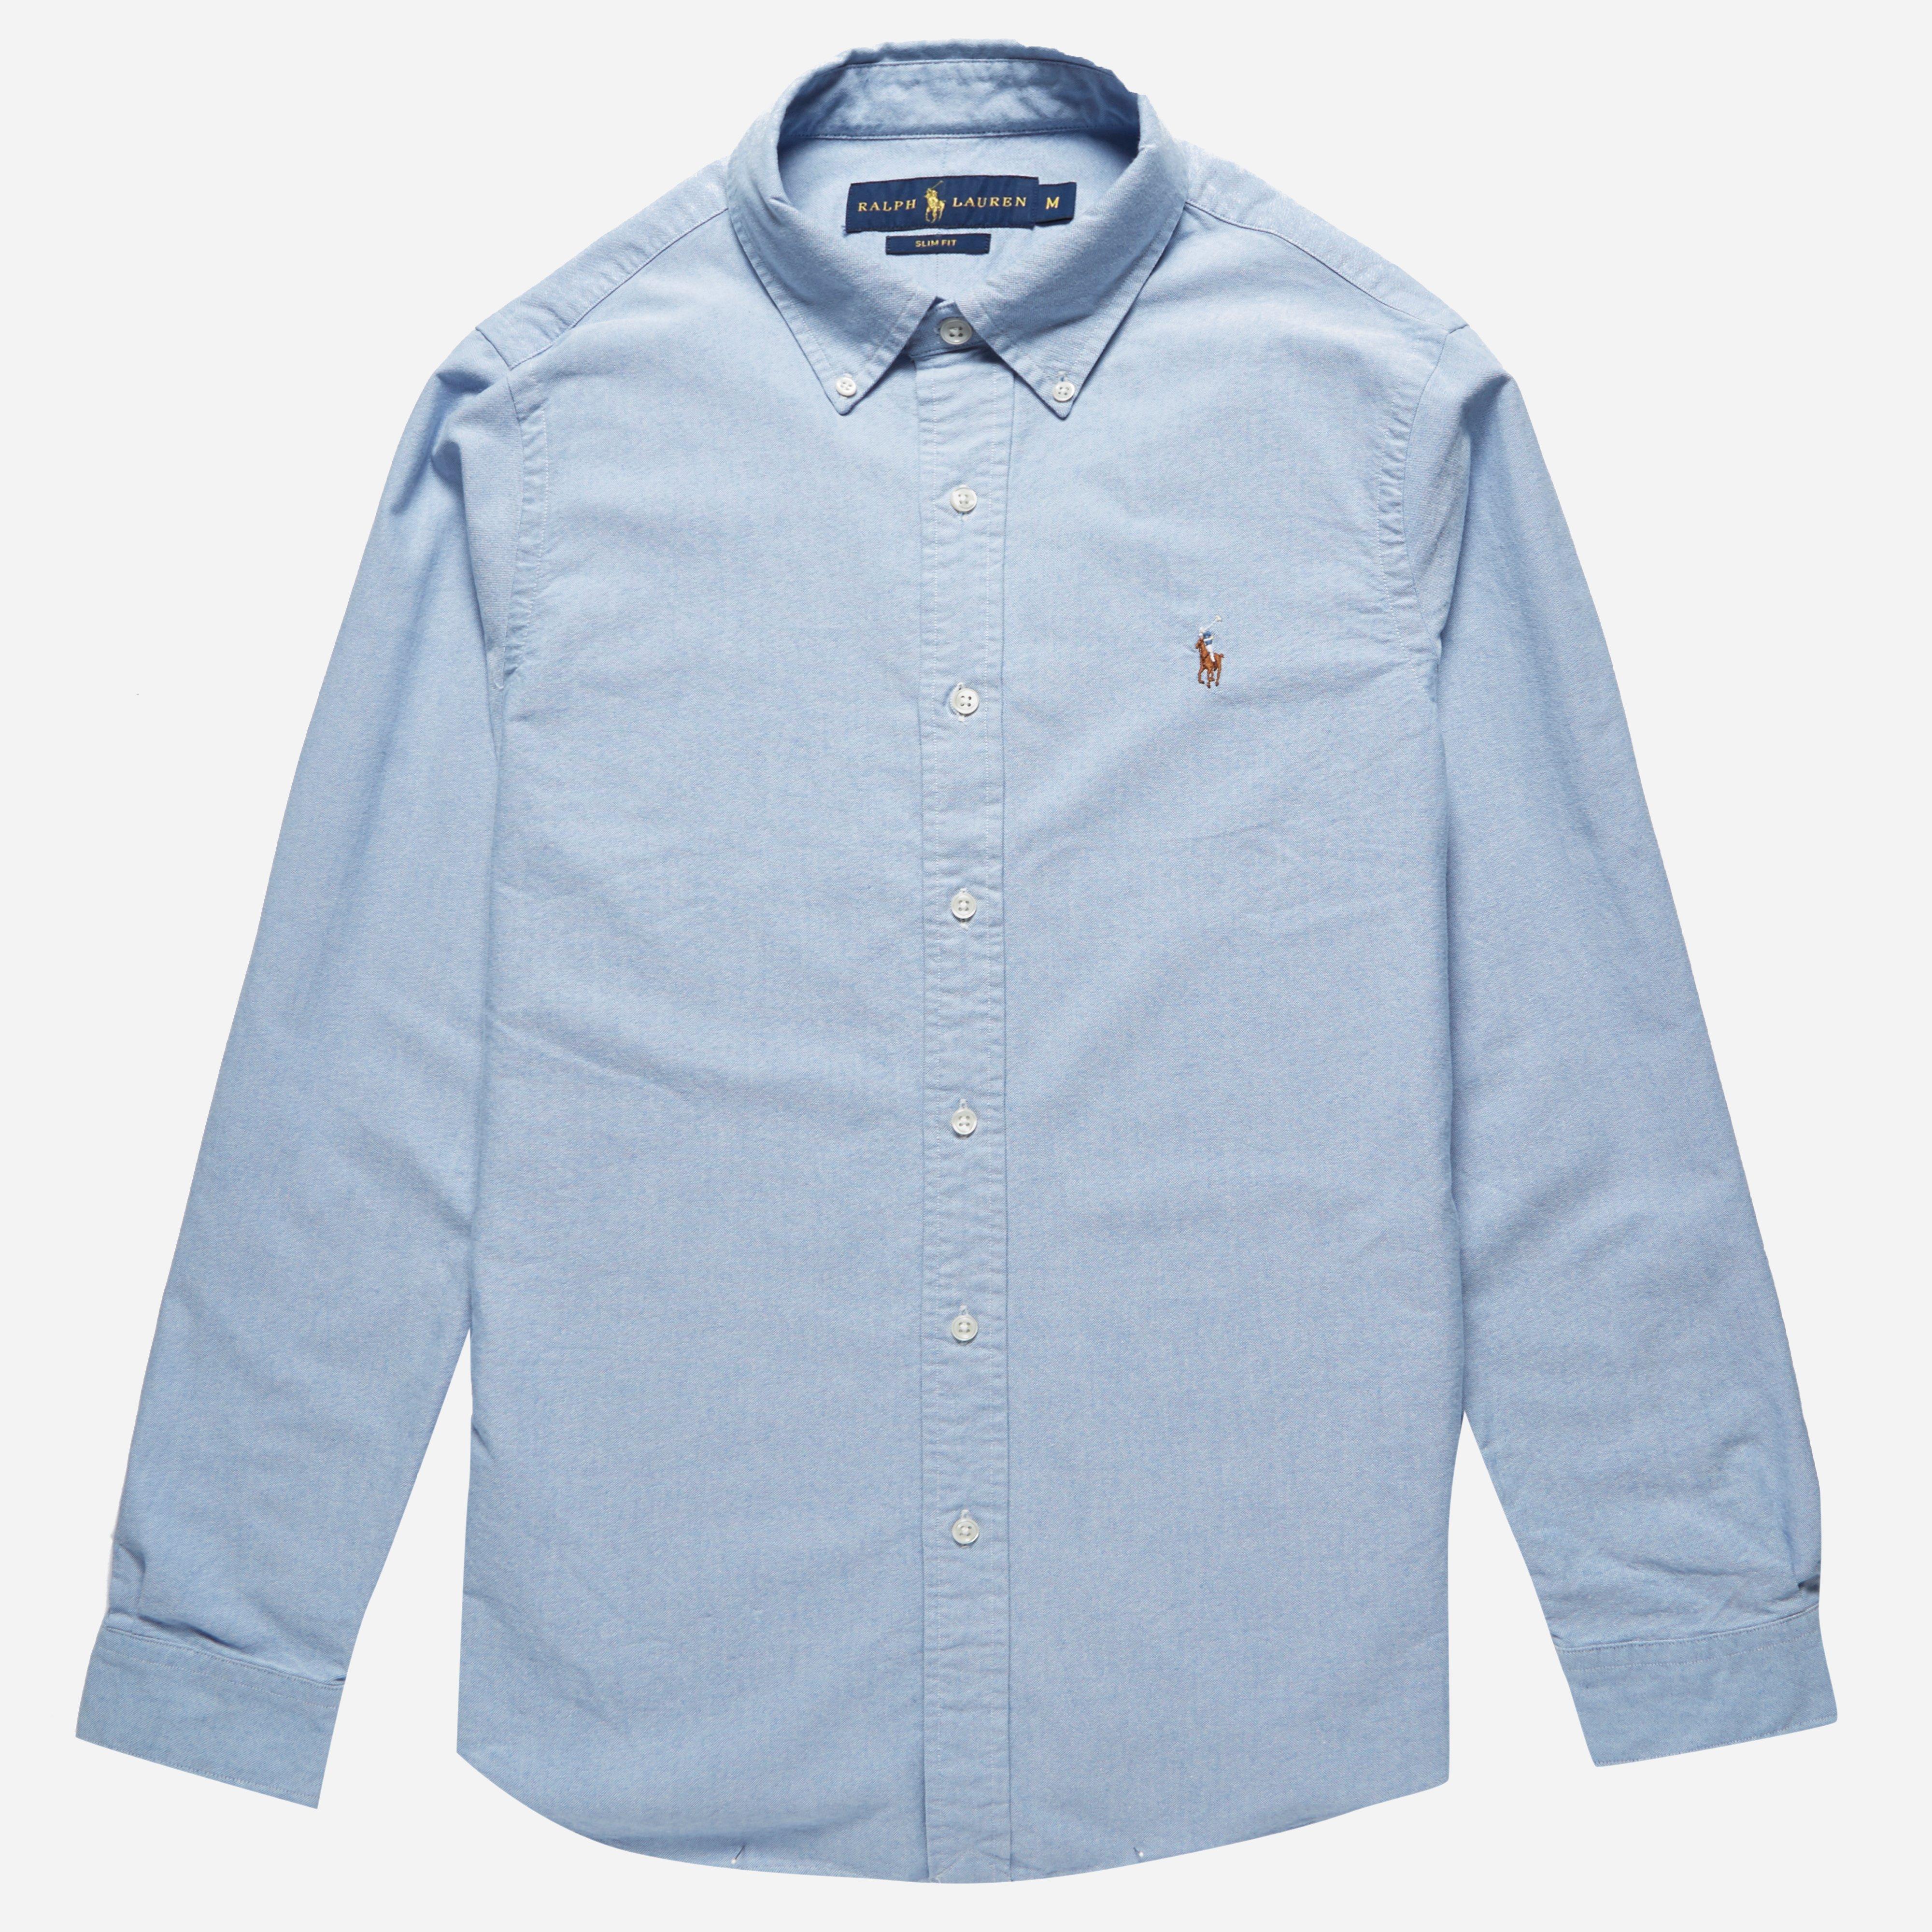 Polo Ralph Lauren Slim Fit Oxford BD Shirt